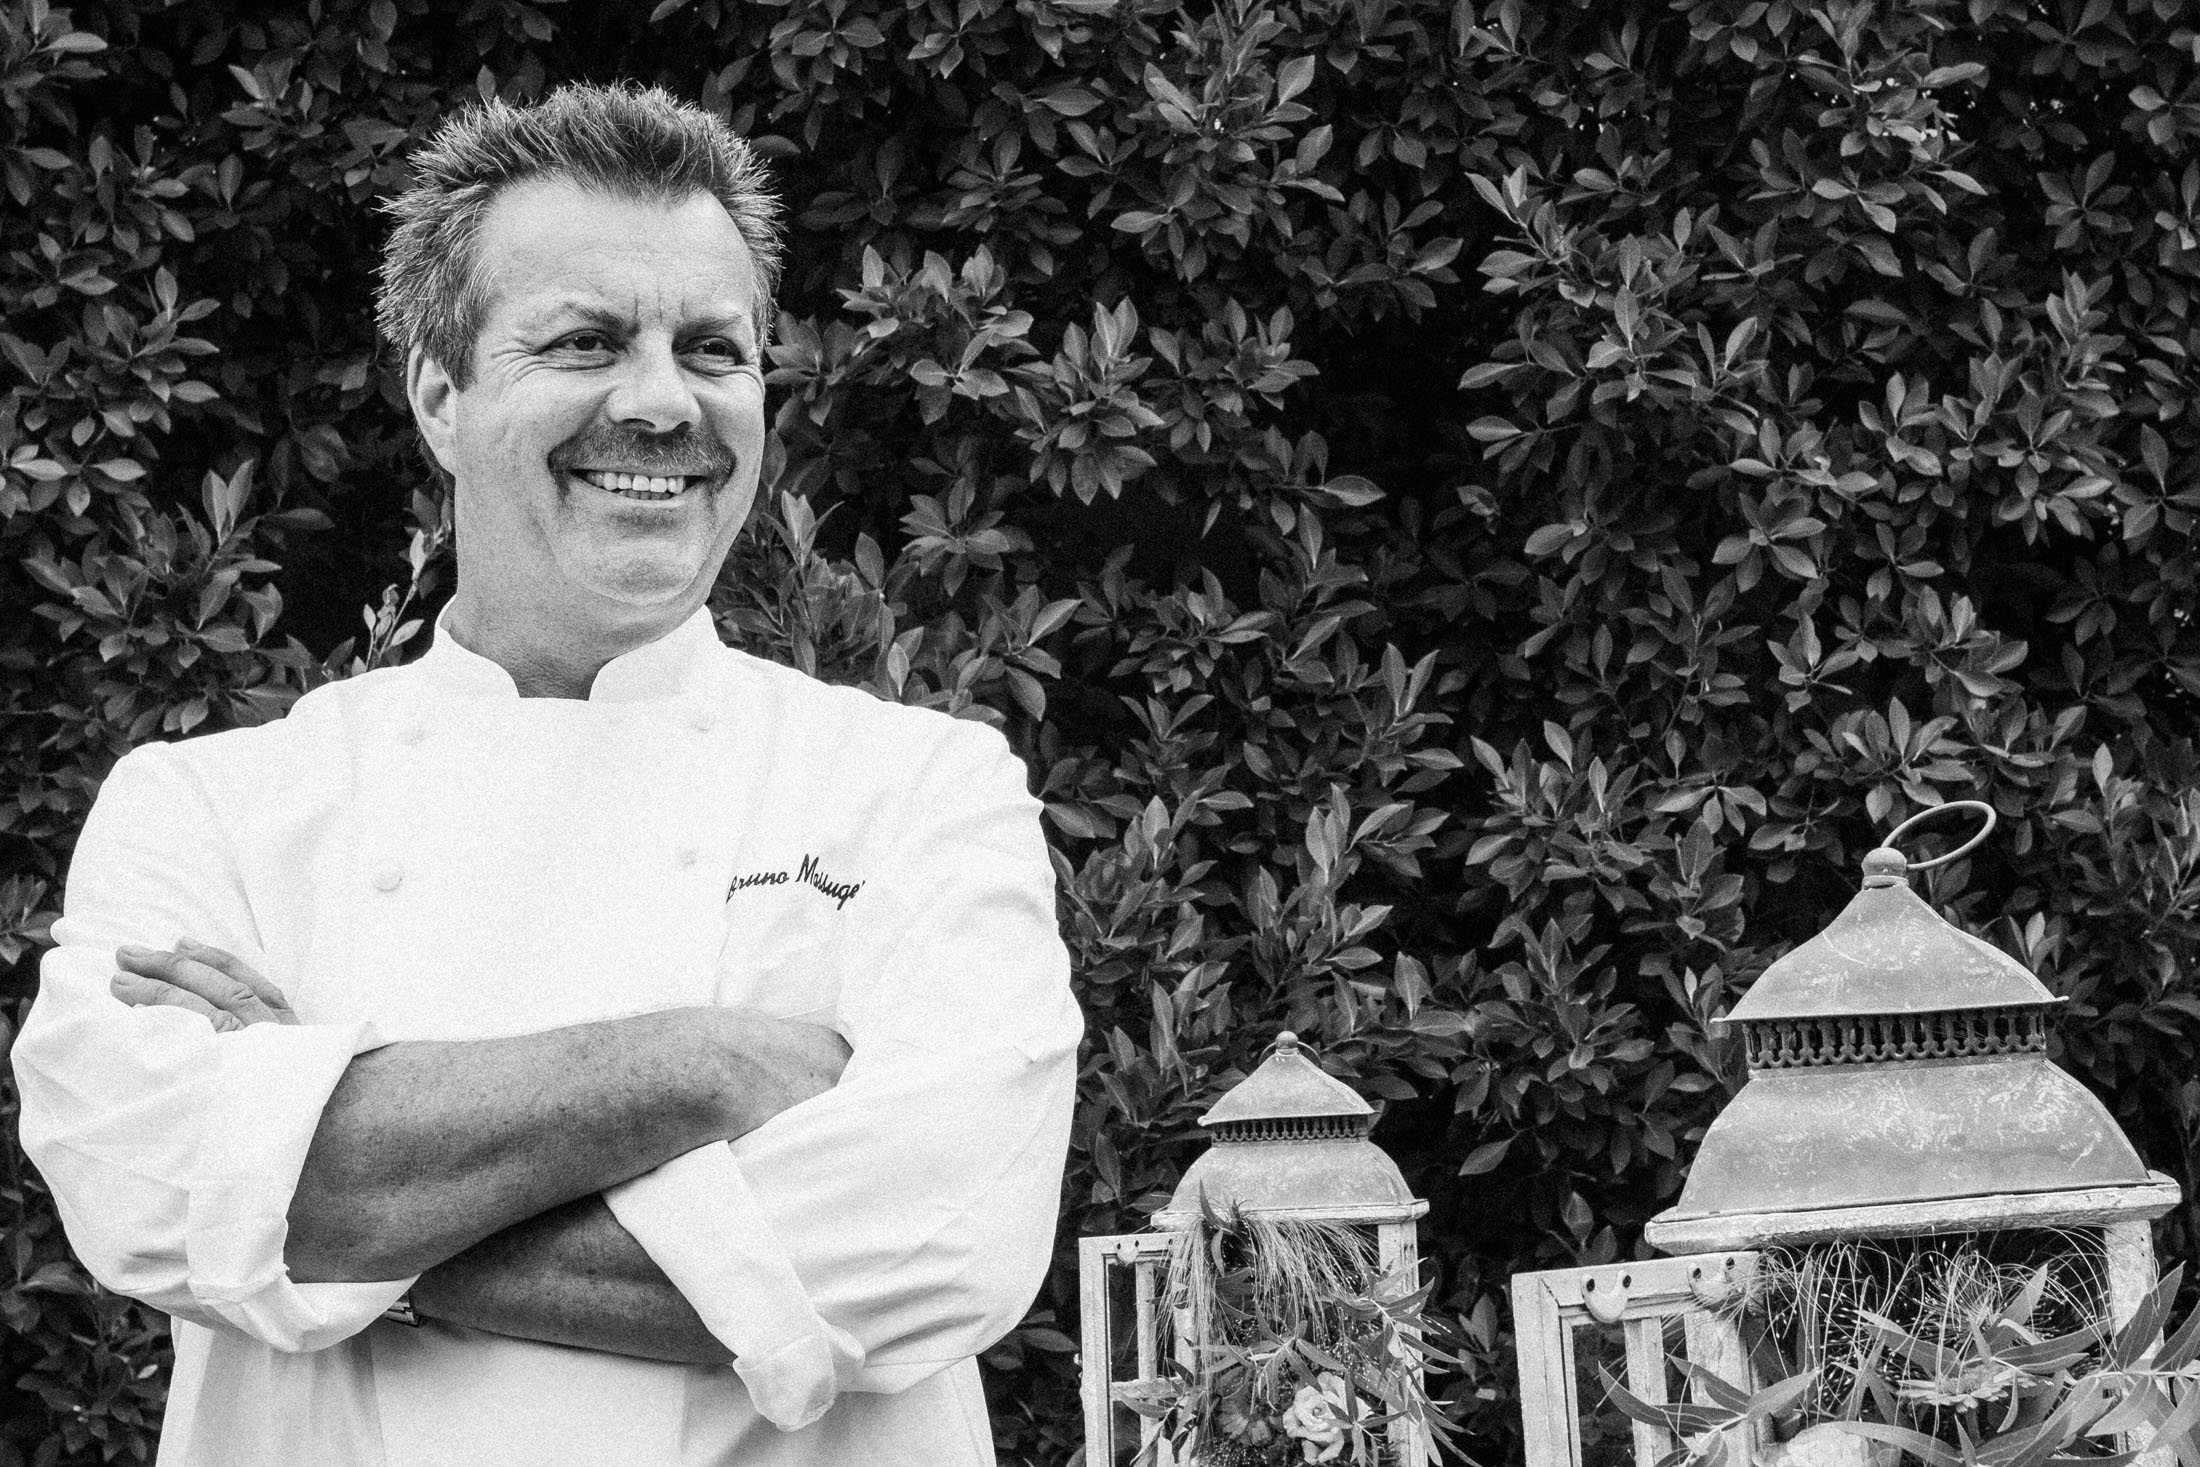 5. Chef Bruno Massuger / Back Bay Bistro / Newport Beach, California